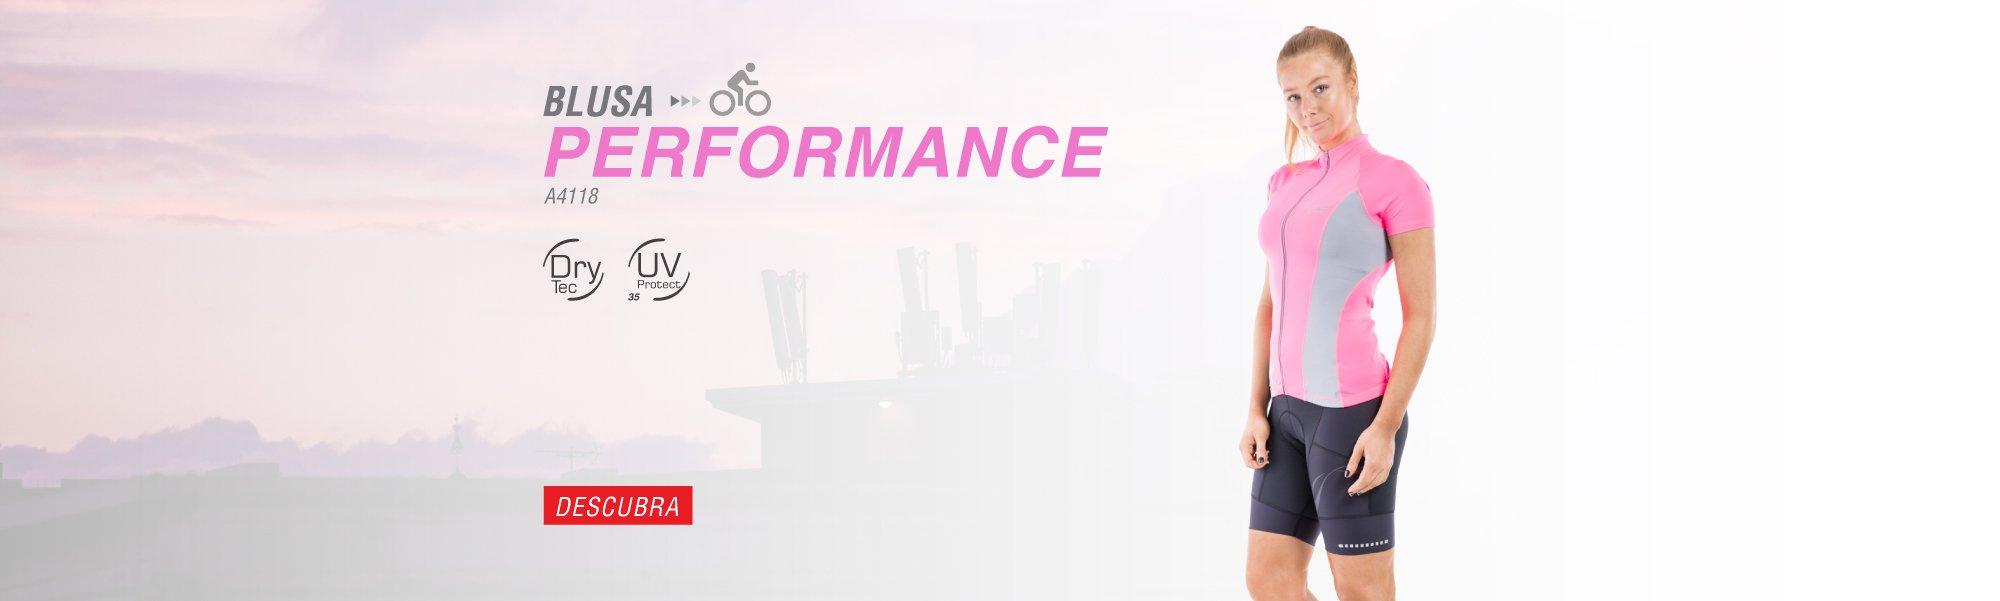 Banner blusa performance A4118